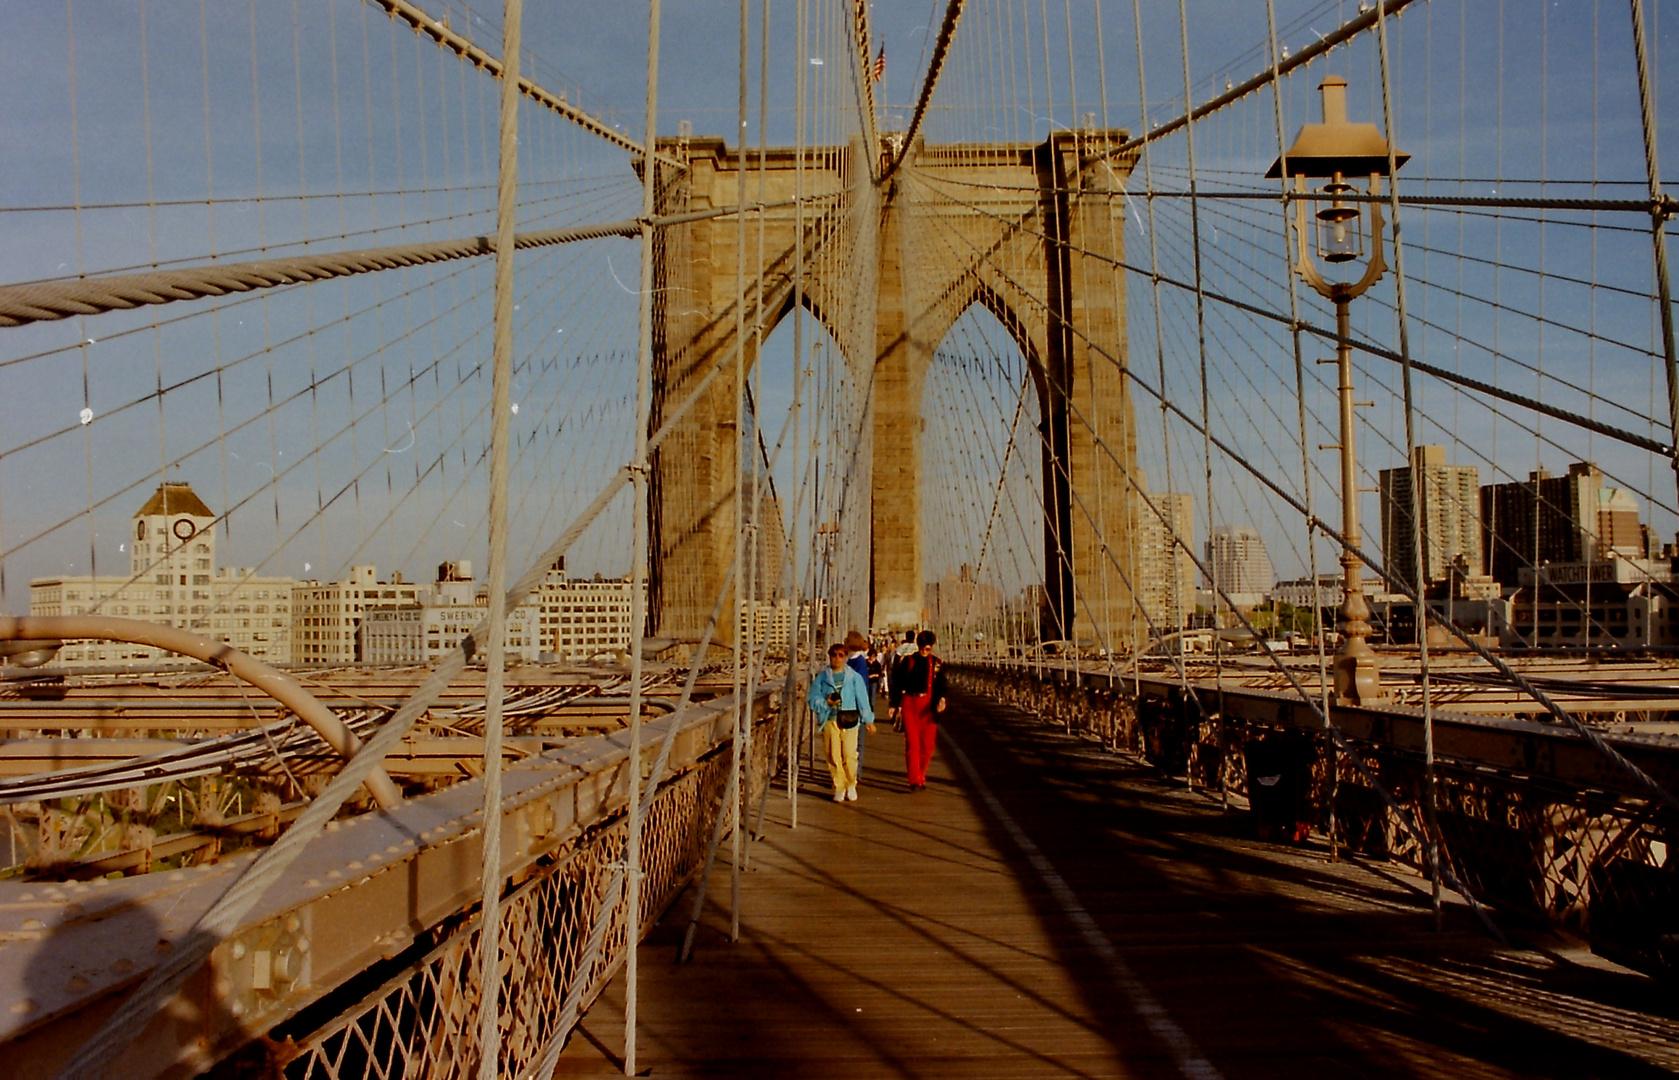 Spaziergang über eine berühmte Brücke